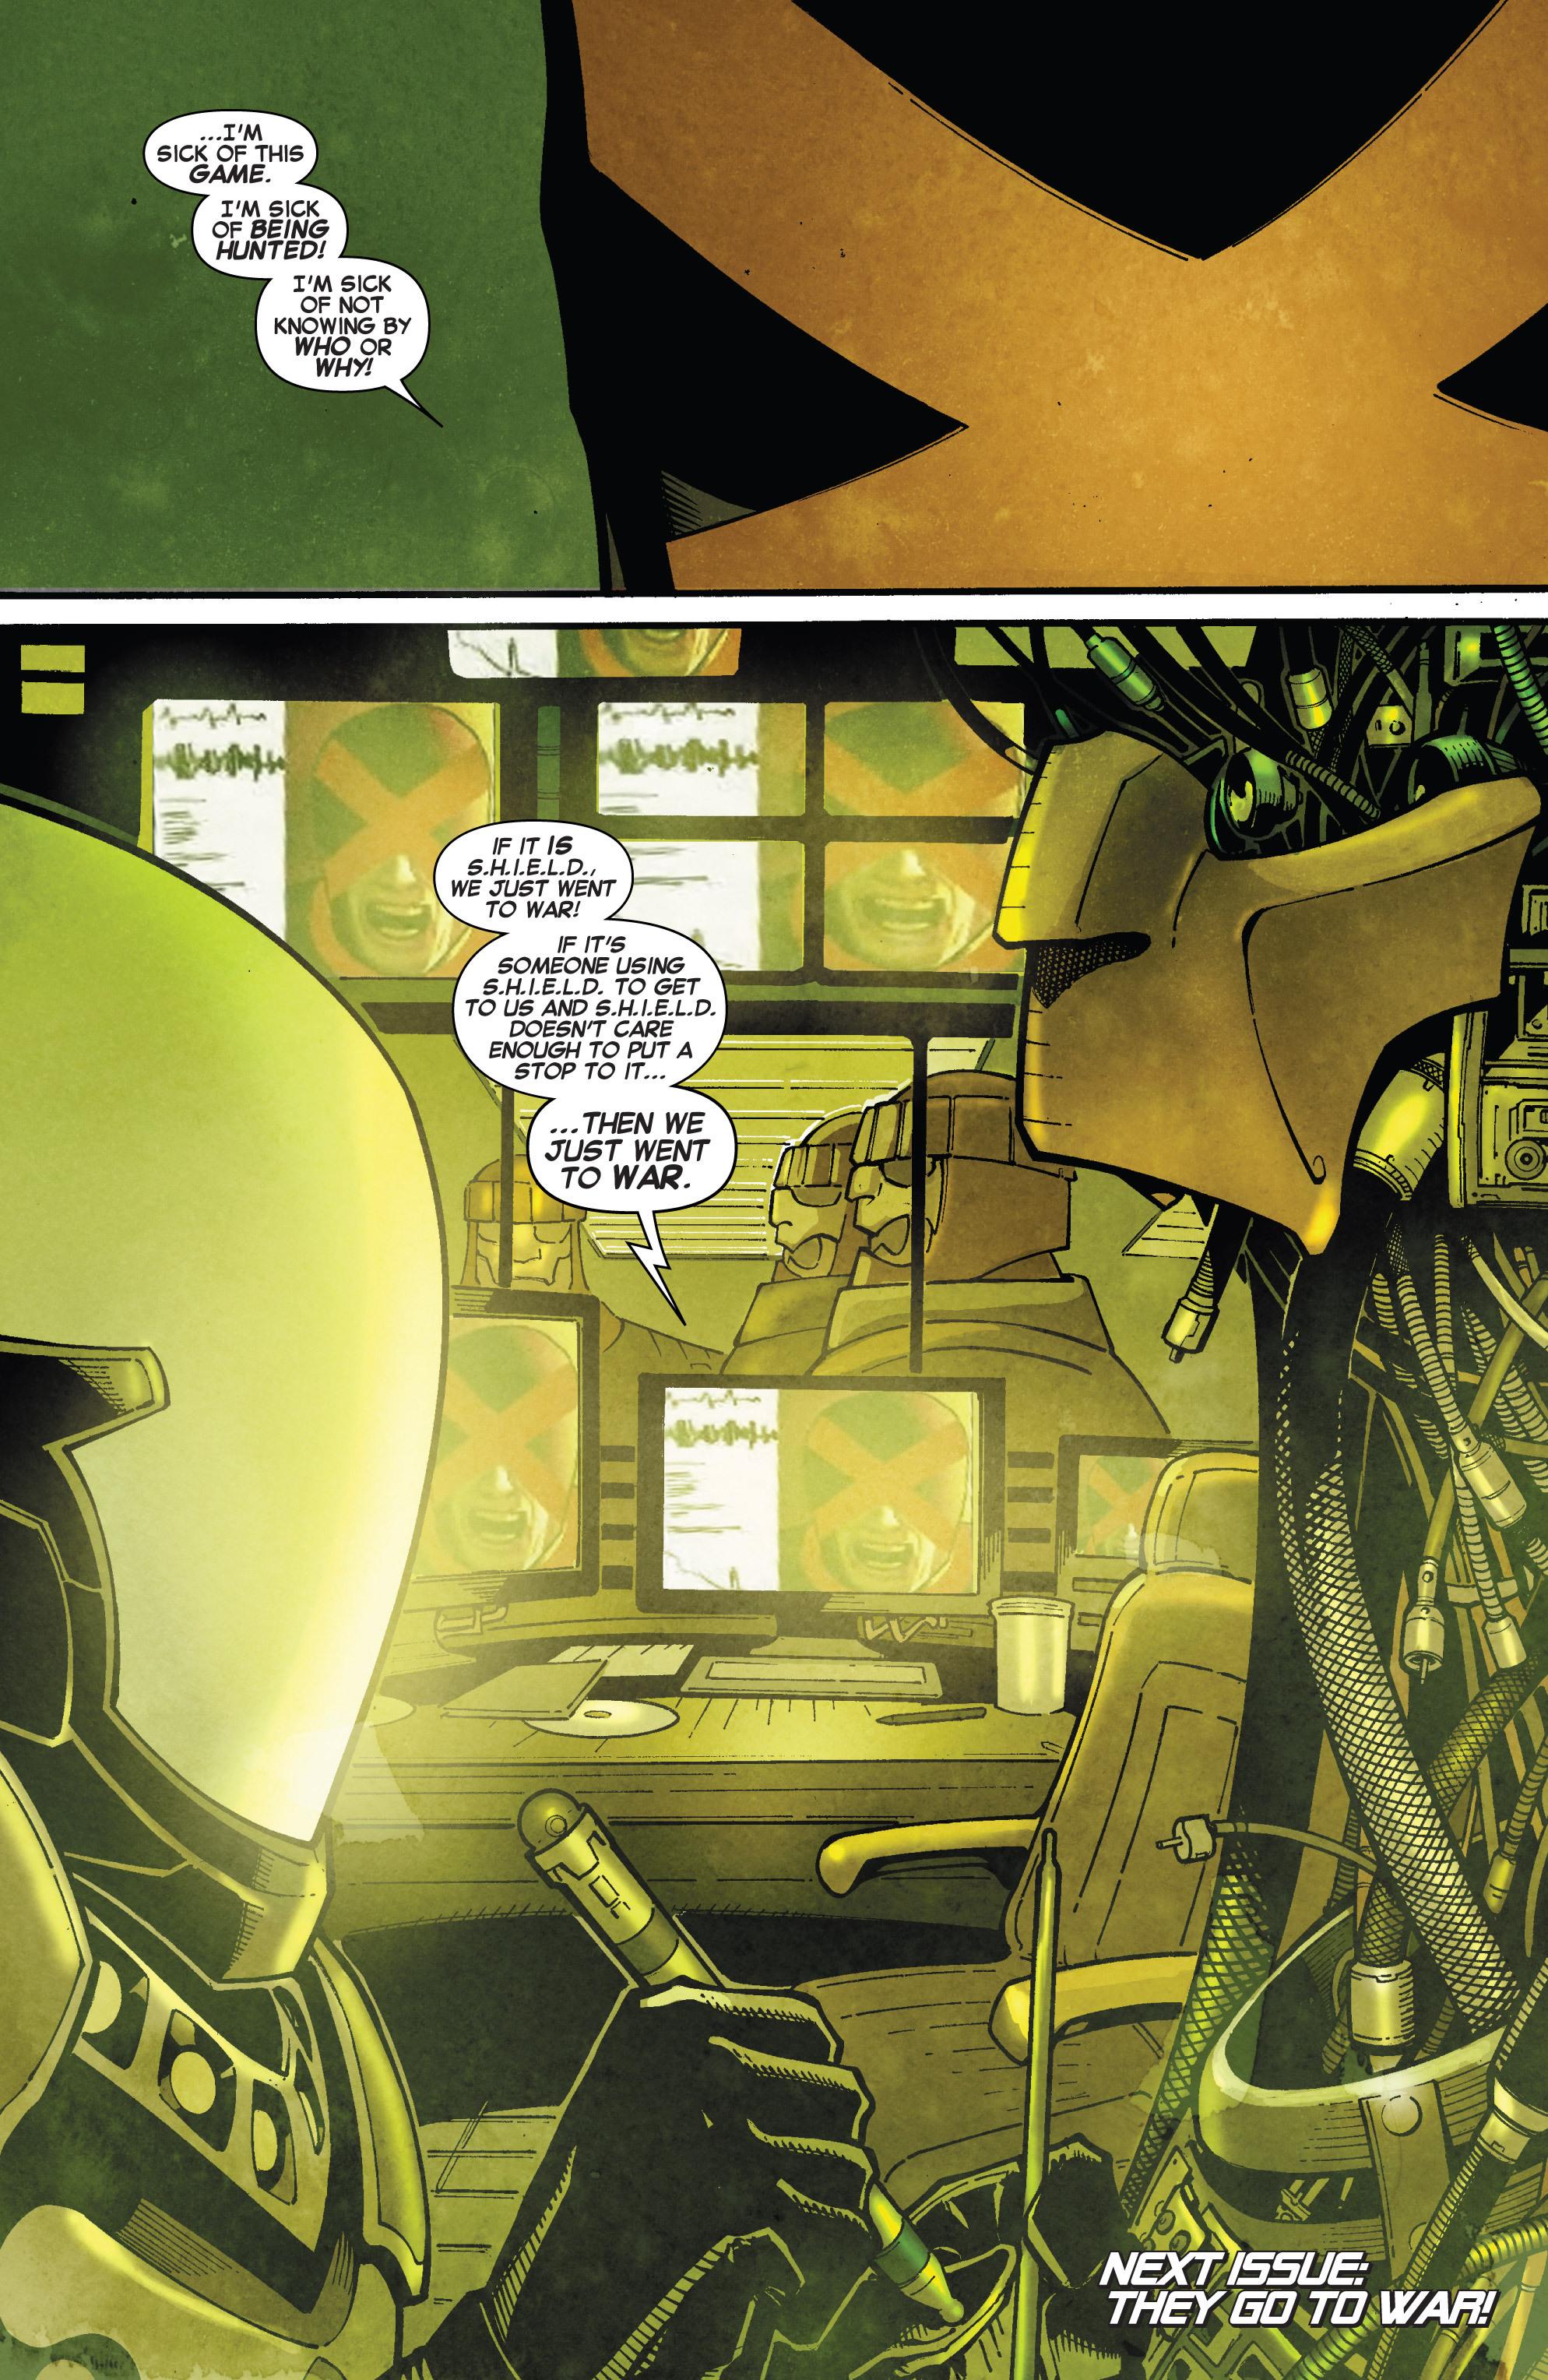 Read online Uncanny X-Men (2013) comic -  Issue # _TPB 4 - vs. S.H.I.E.L.D - 20